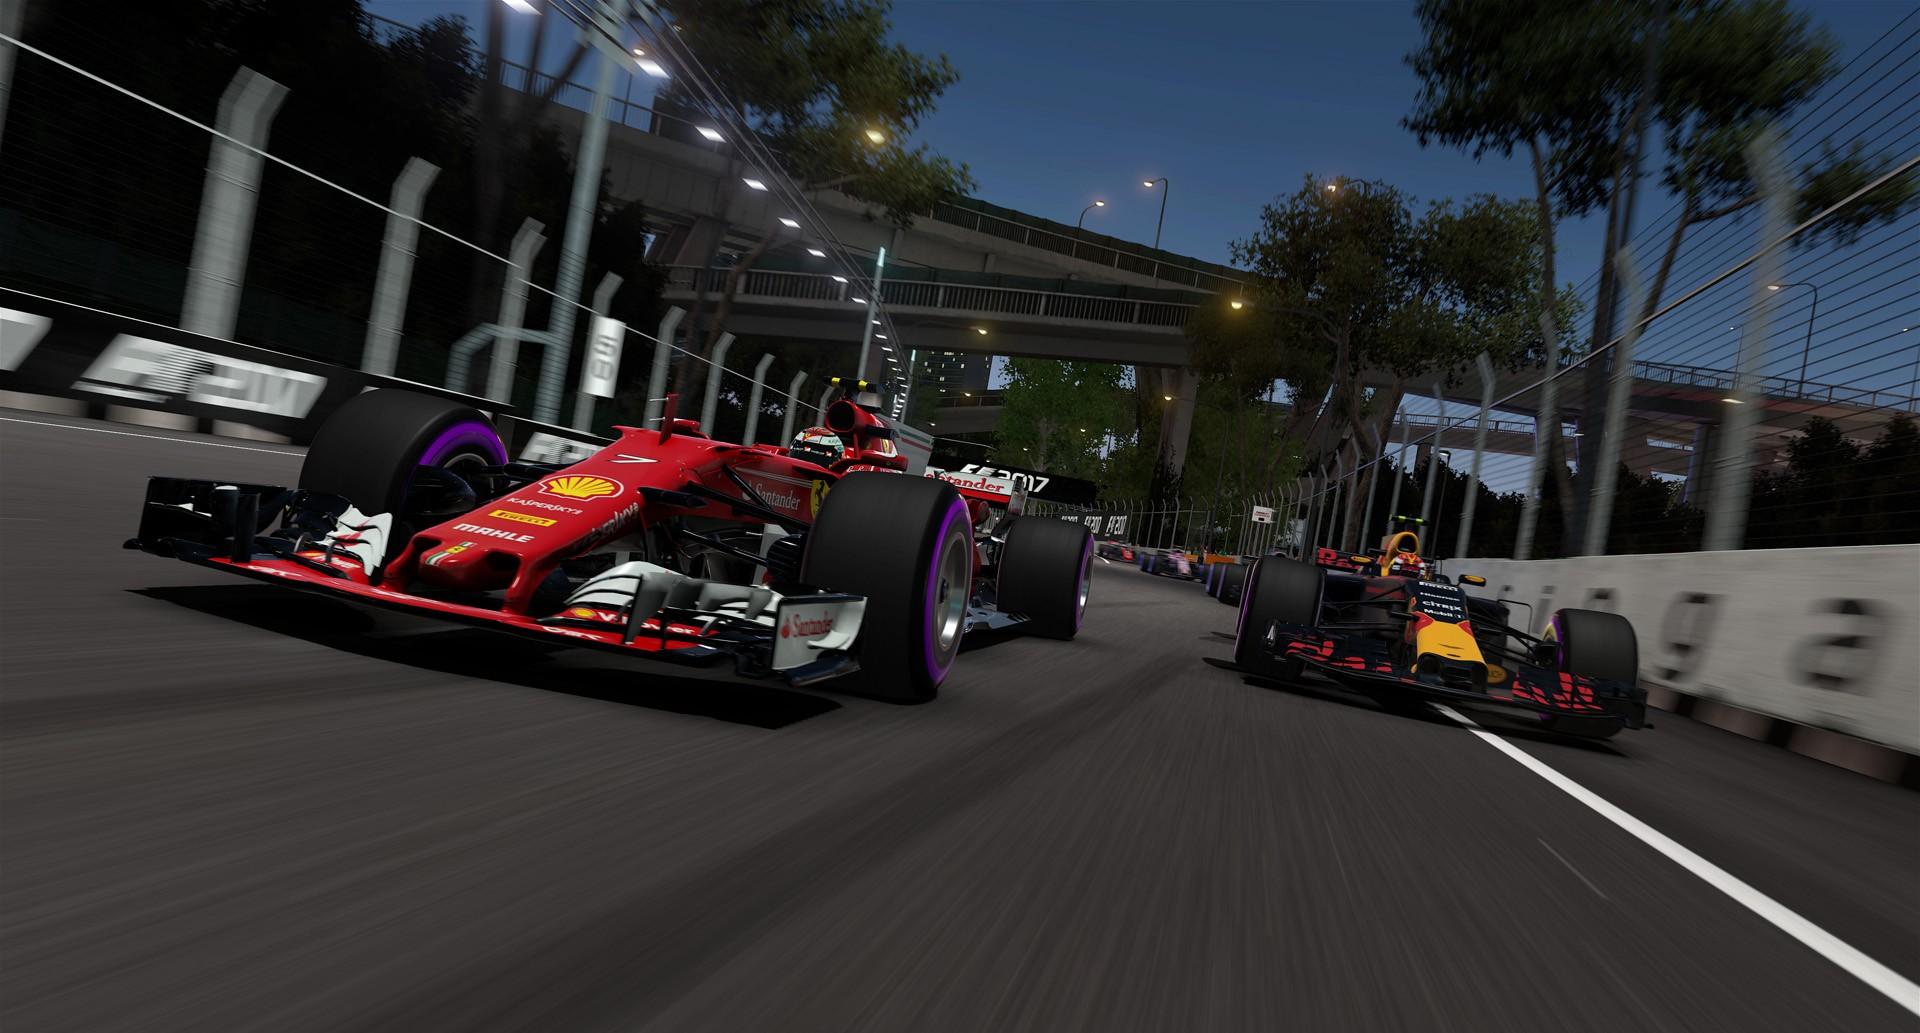 Lego Formula Cars Racing Game